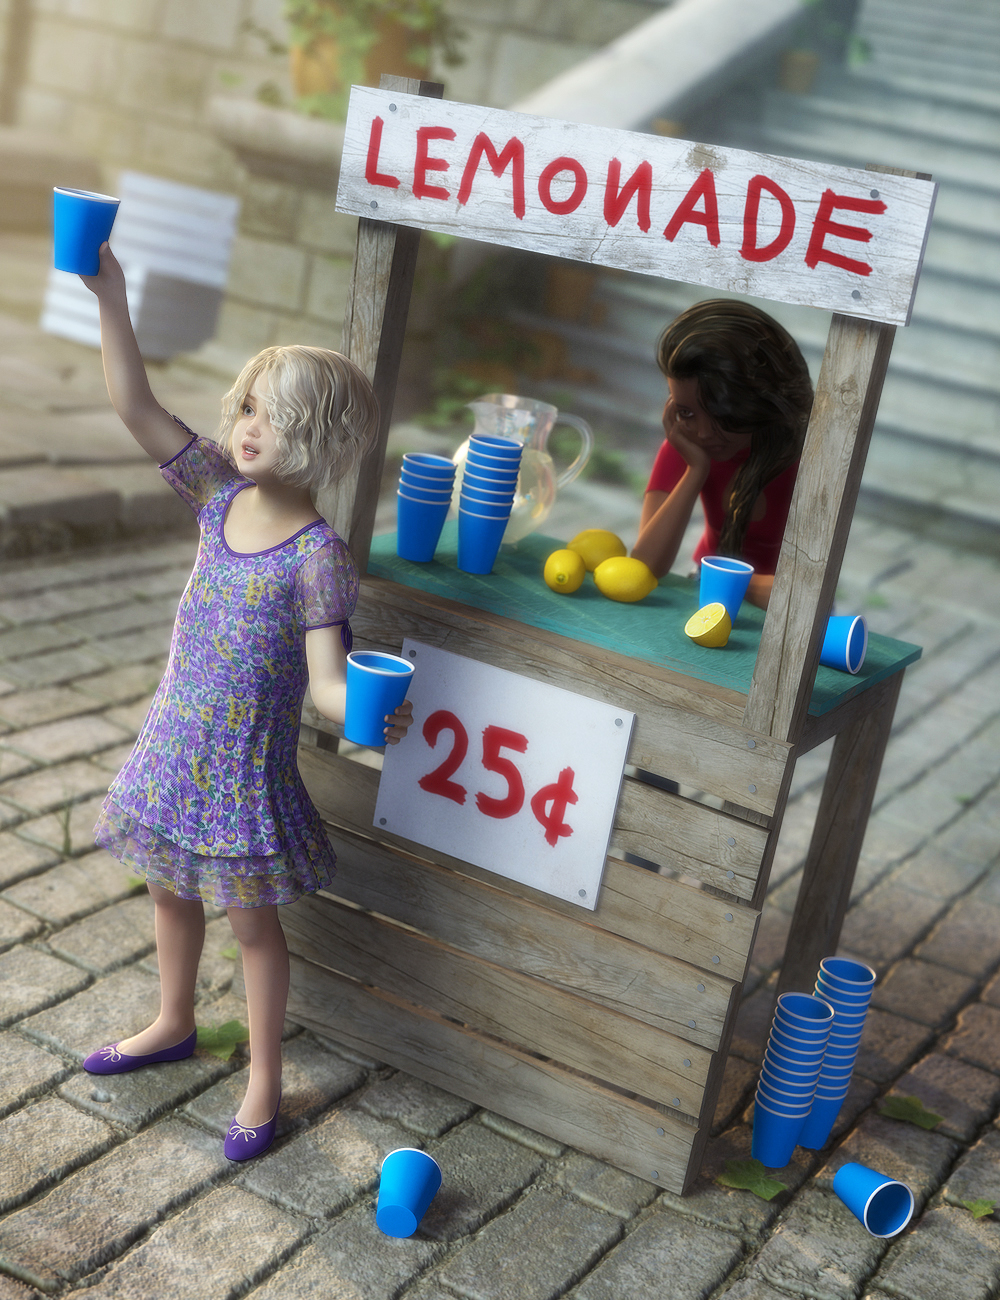 Lemonade Stand by: Atticus Bones, 3D Models by Daz 3D